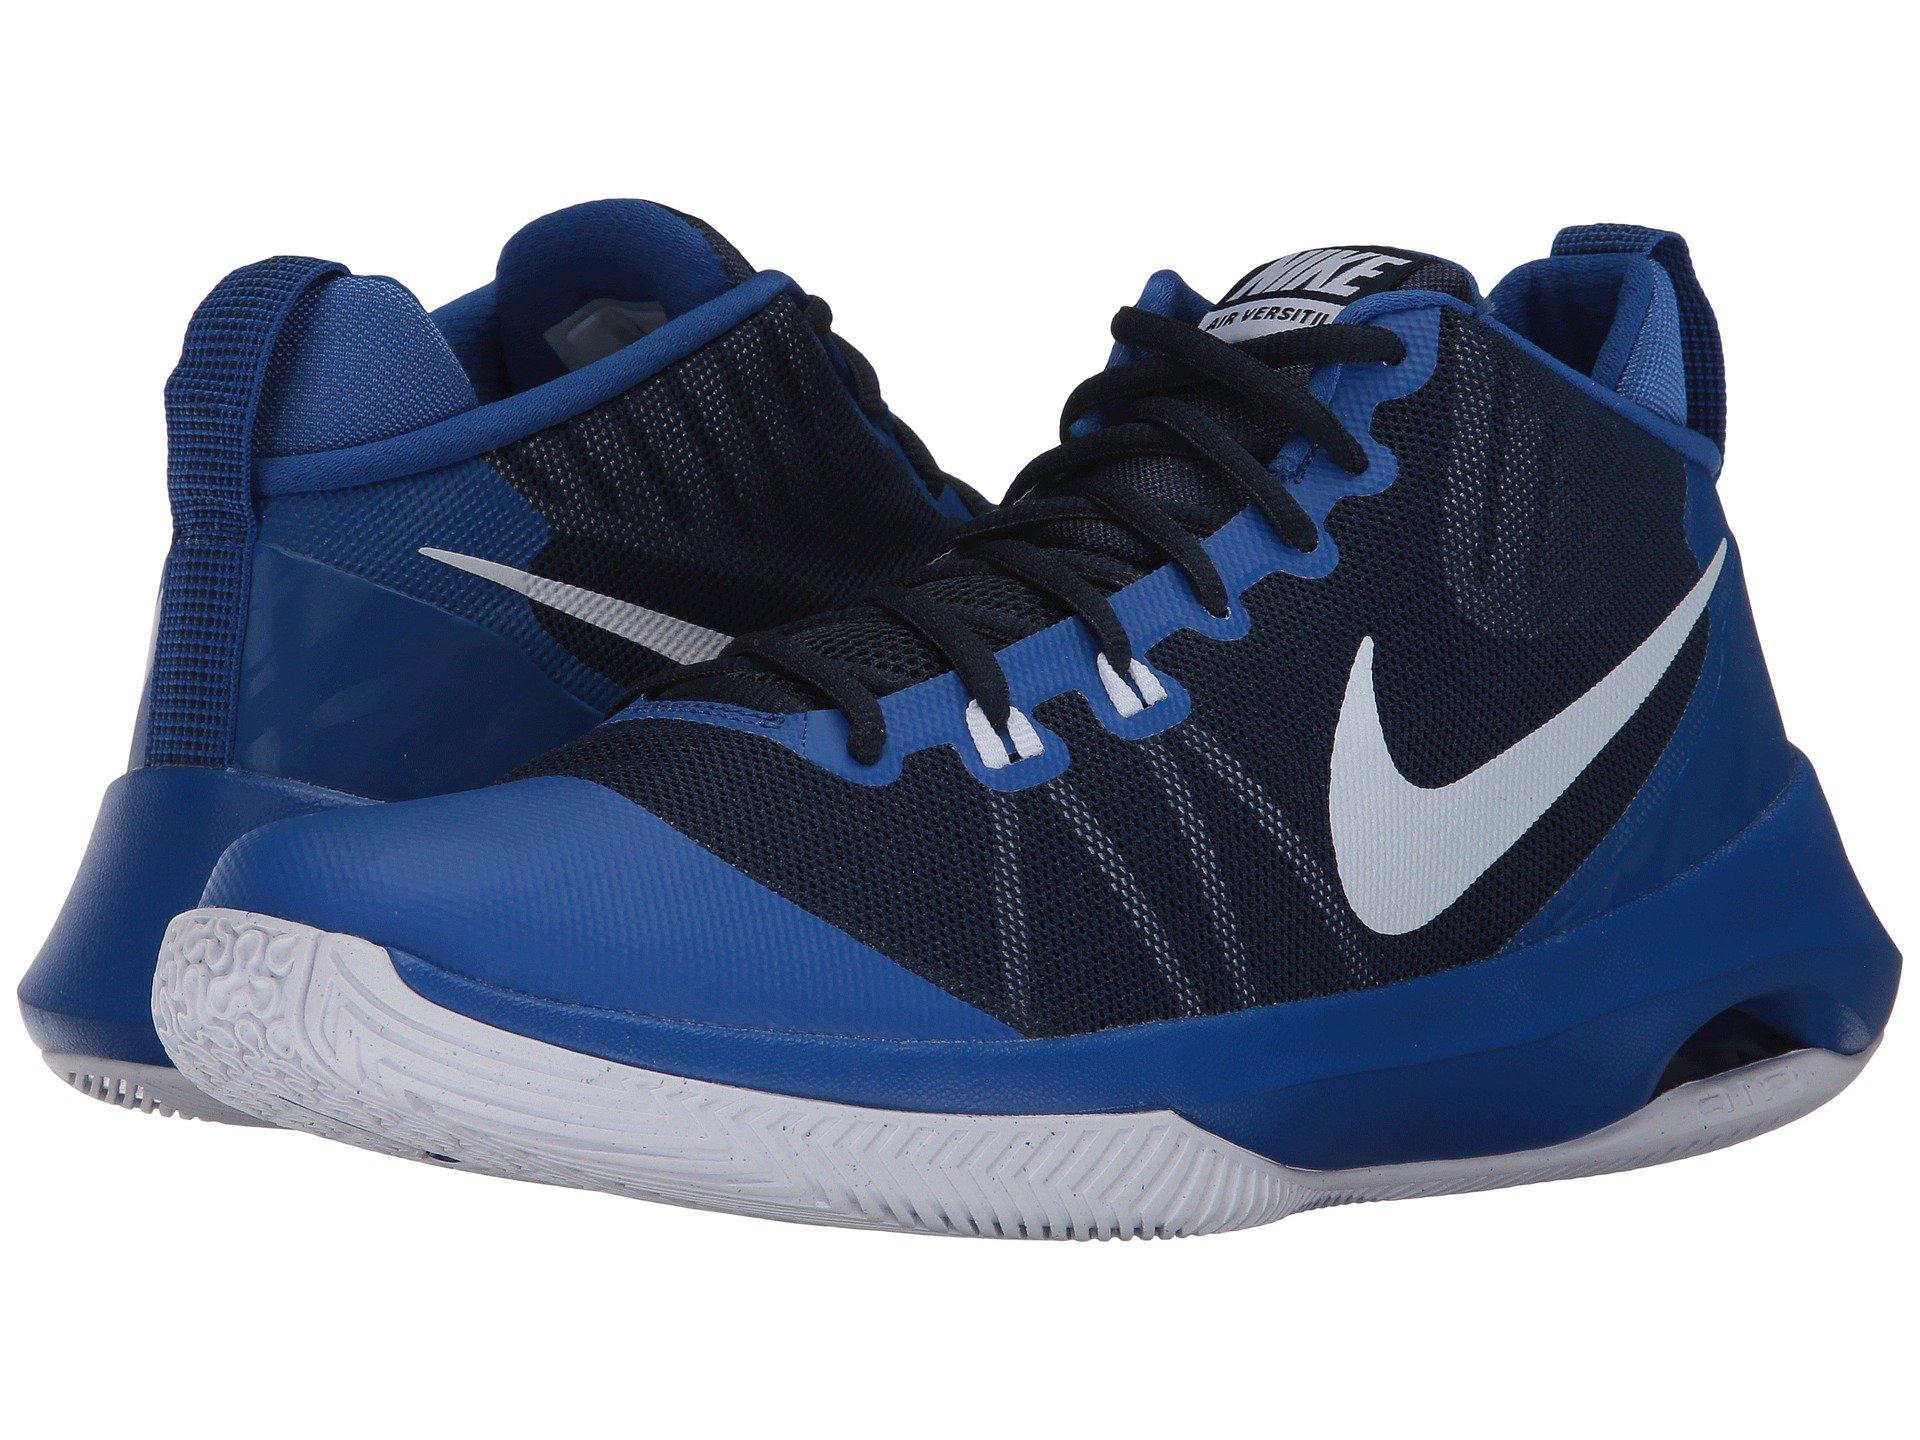 cb4f700ac18 Lyst - Nike Air Versatile in Blue for Men